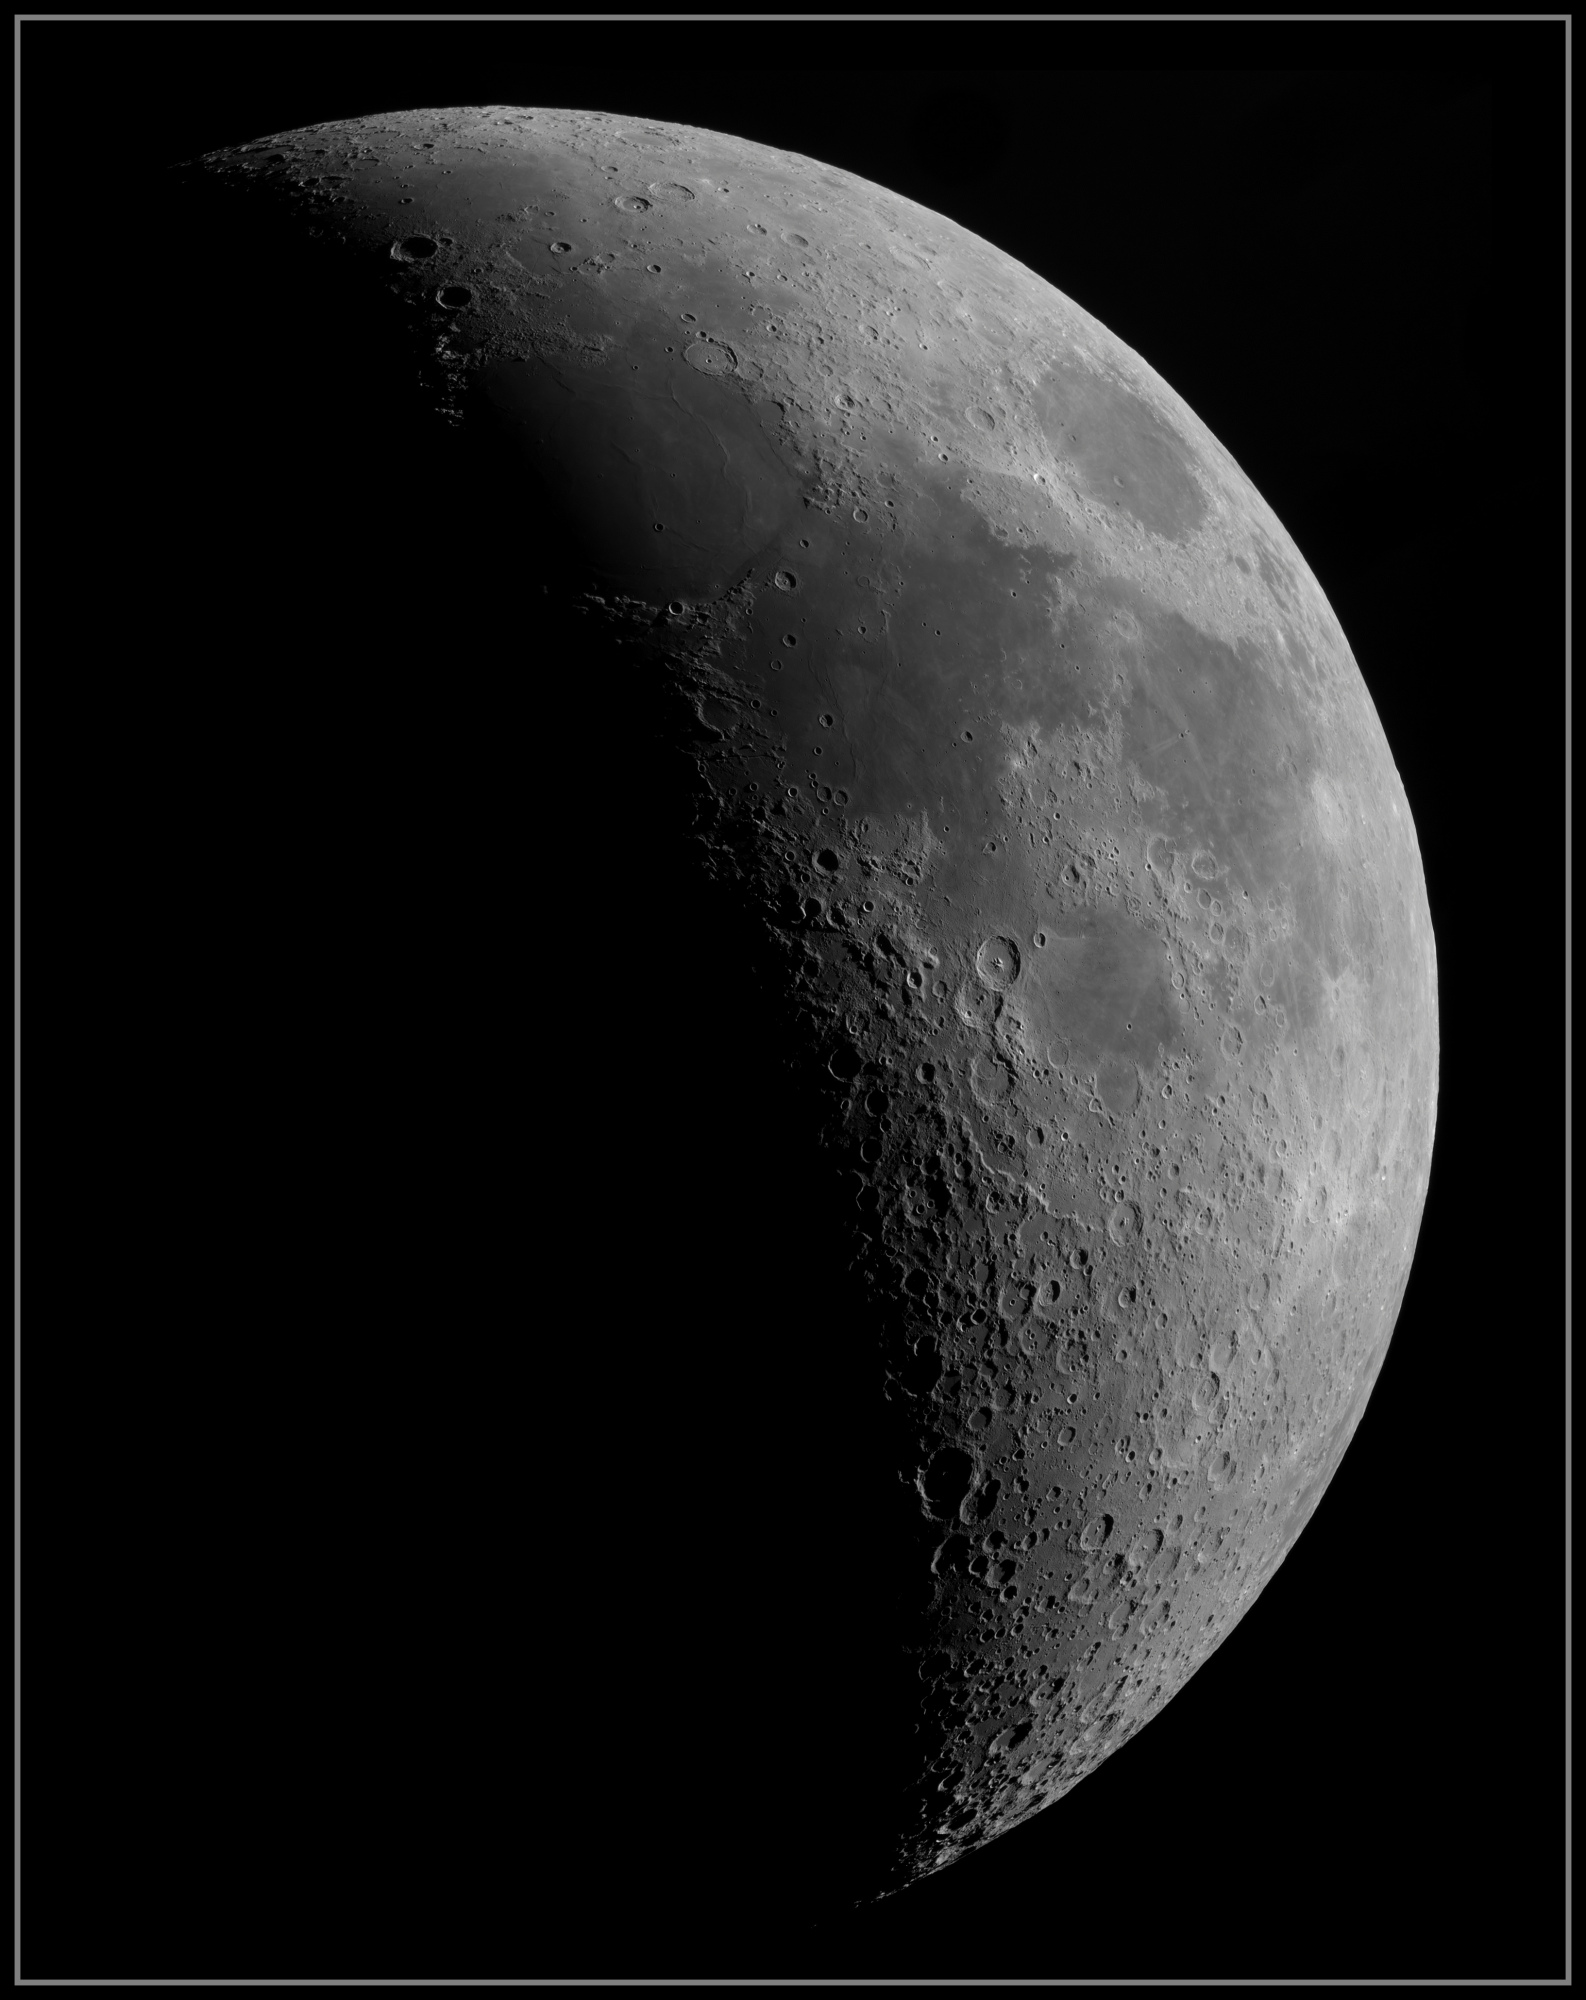 5ed2a2b67c3c1_Moon_211209_280520_ZWOASI290MM_Continuum_AS_P35_lapl4_ap258_stitch-1.thumb.jpg.f854d4e8b90cf515e4928ab57326ad25.jpg